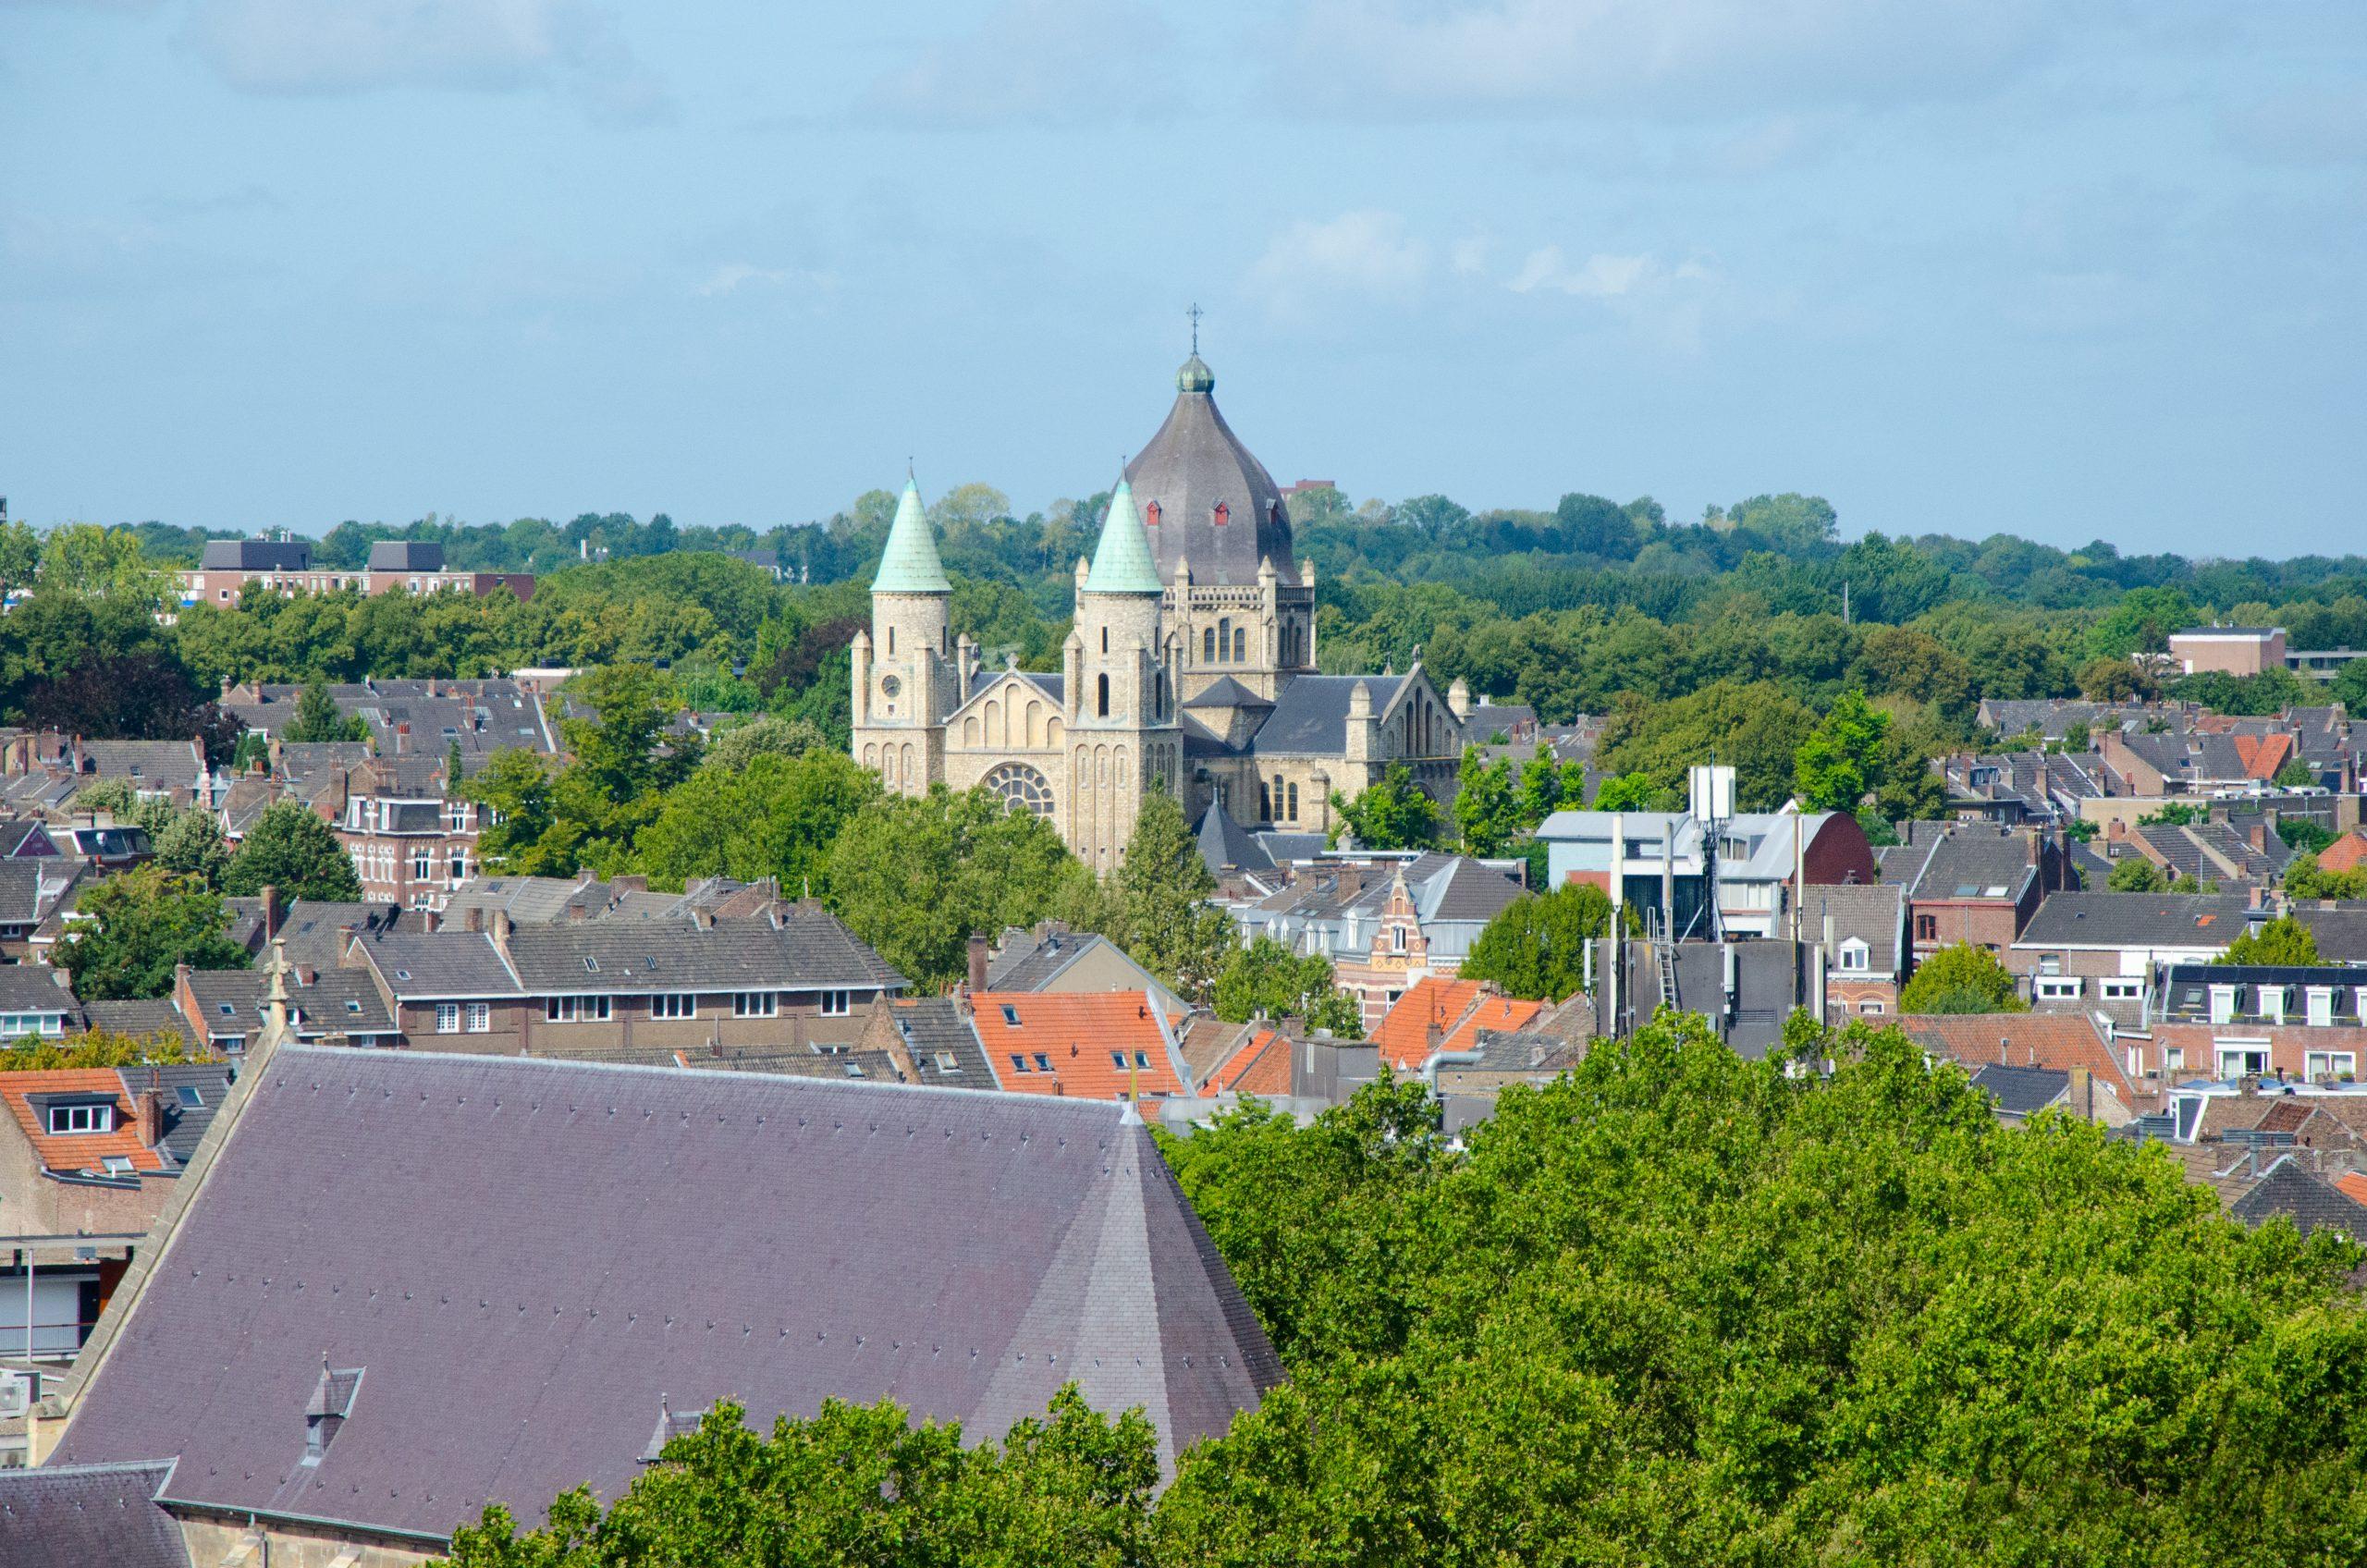 St. Lambertuskerk in Maastricht